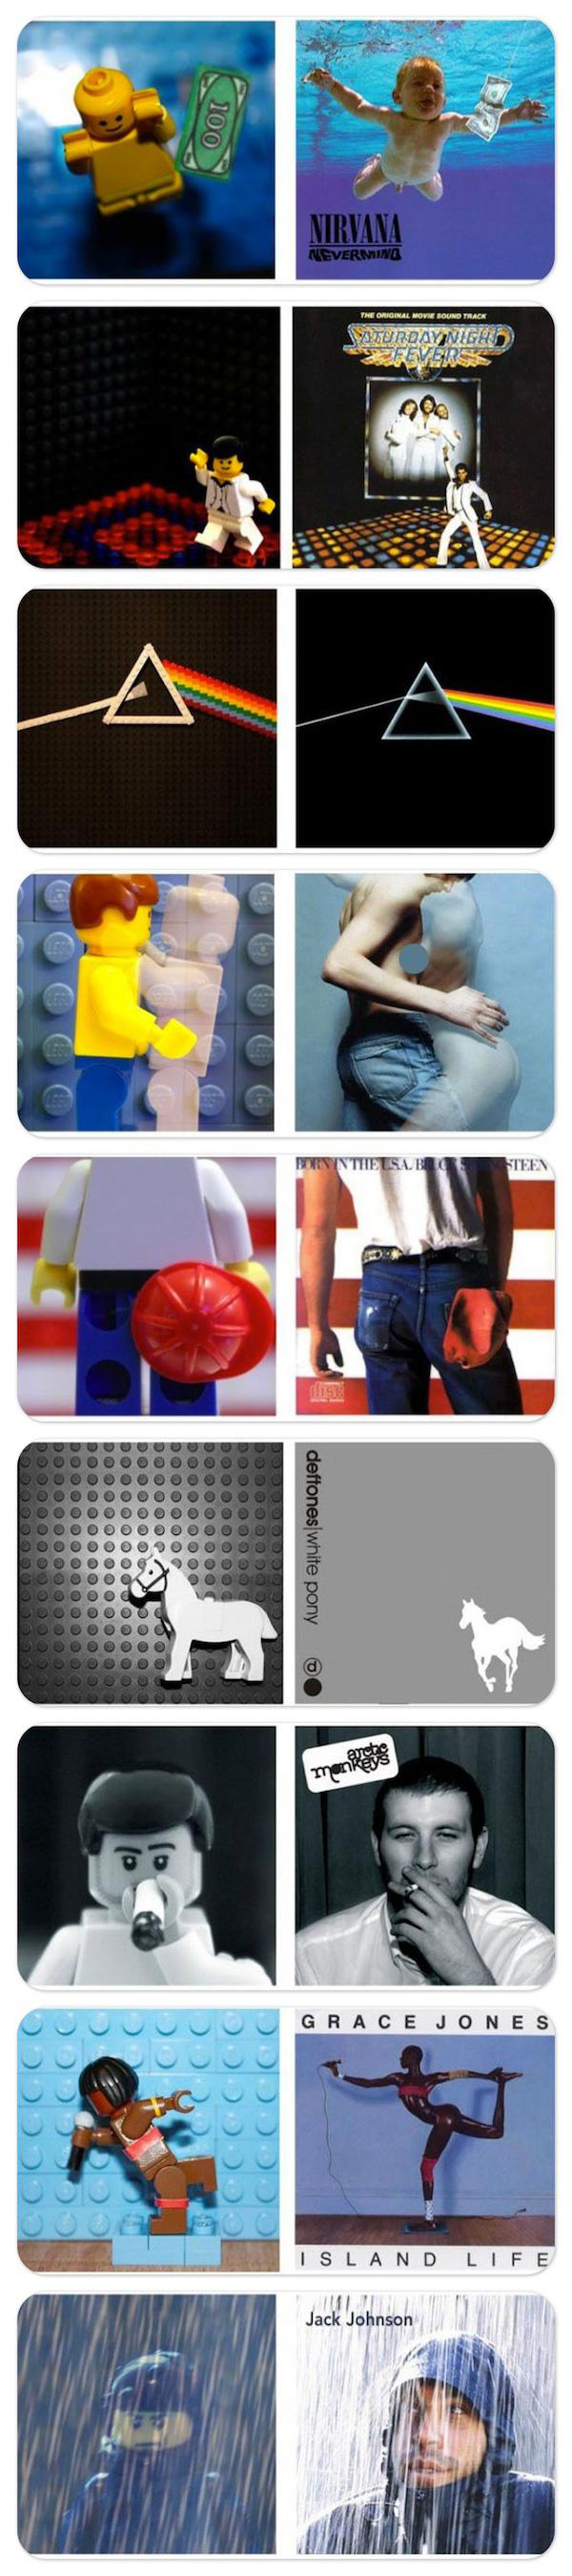 Capas de discos by Lego